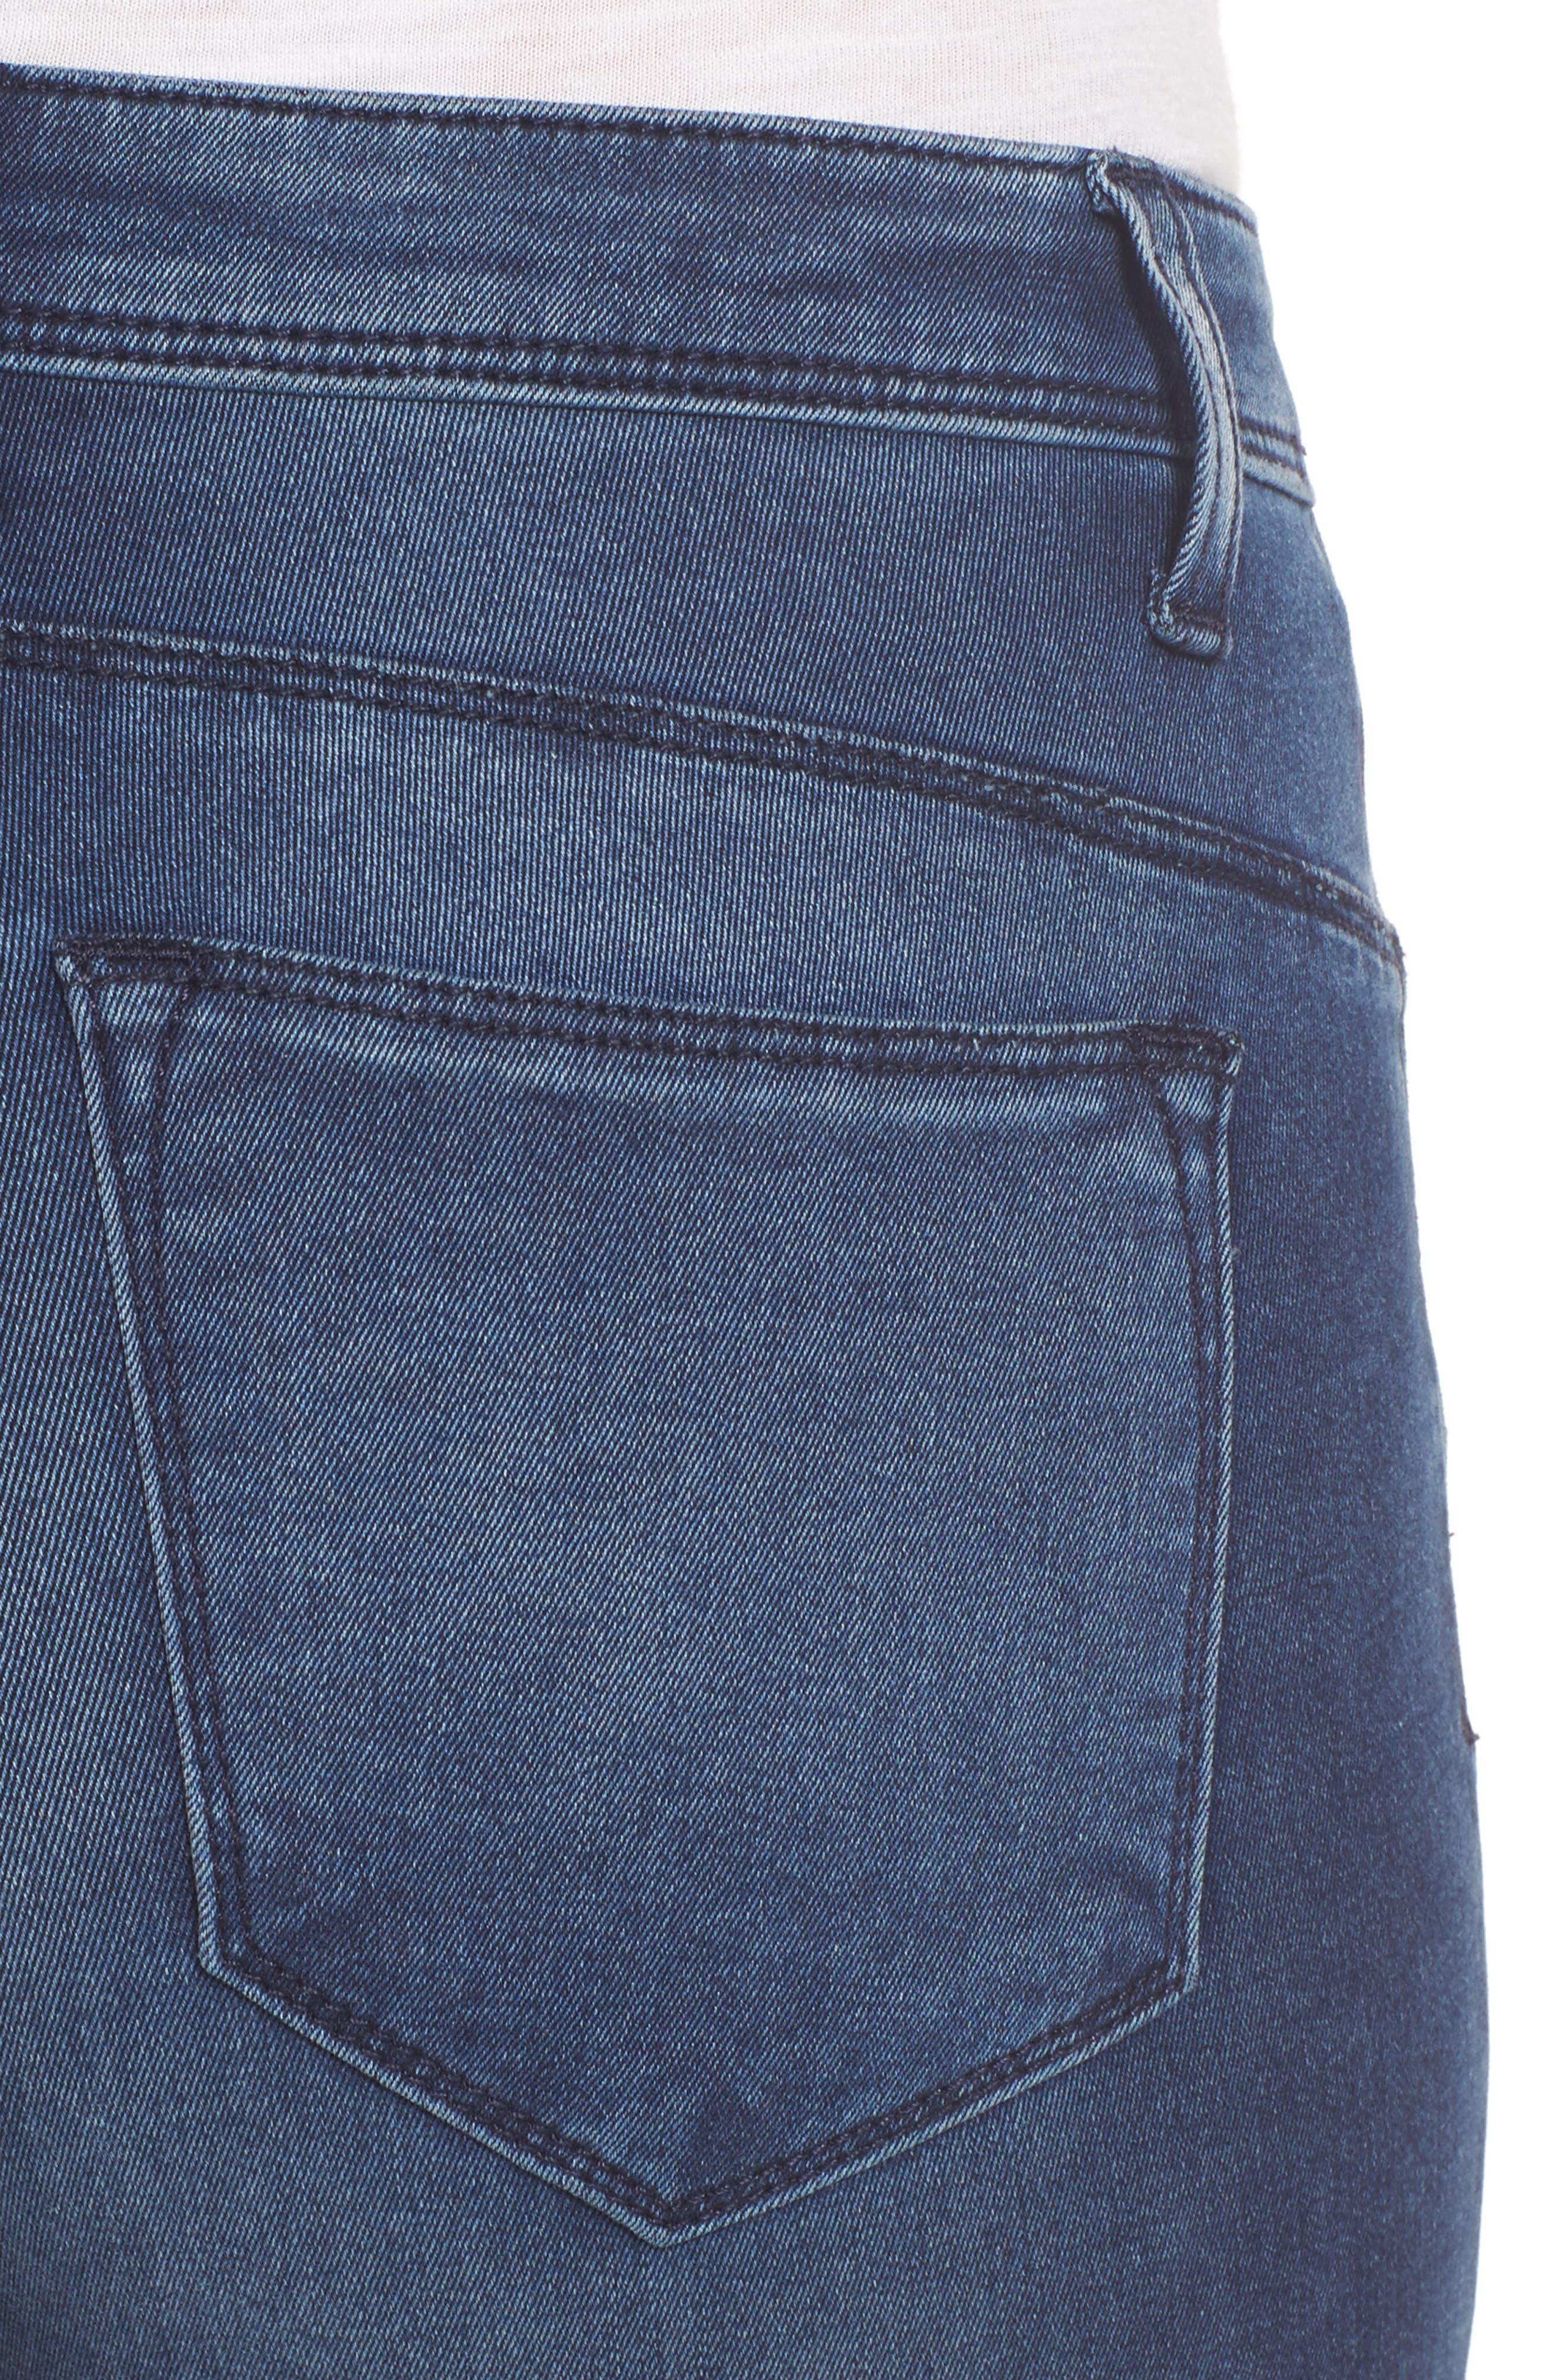 Alternate Image 4  - KUT from the Kloth Jennifer Ultra Skinny Jeans (Fashionable)